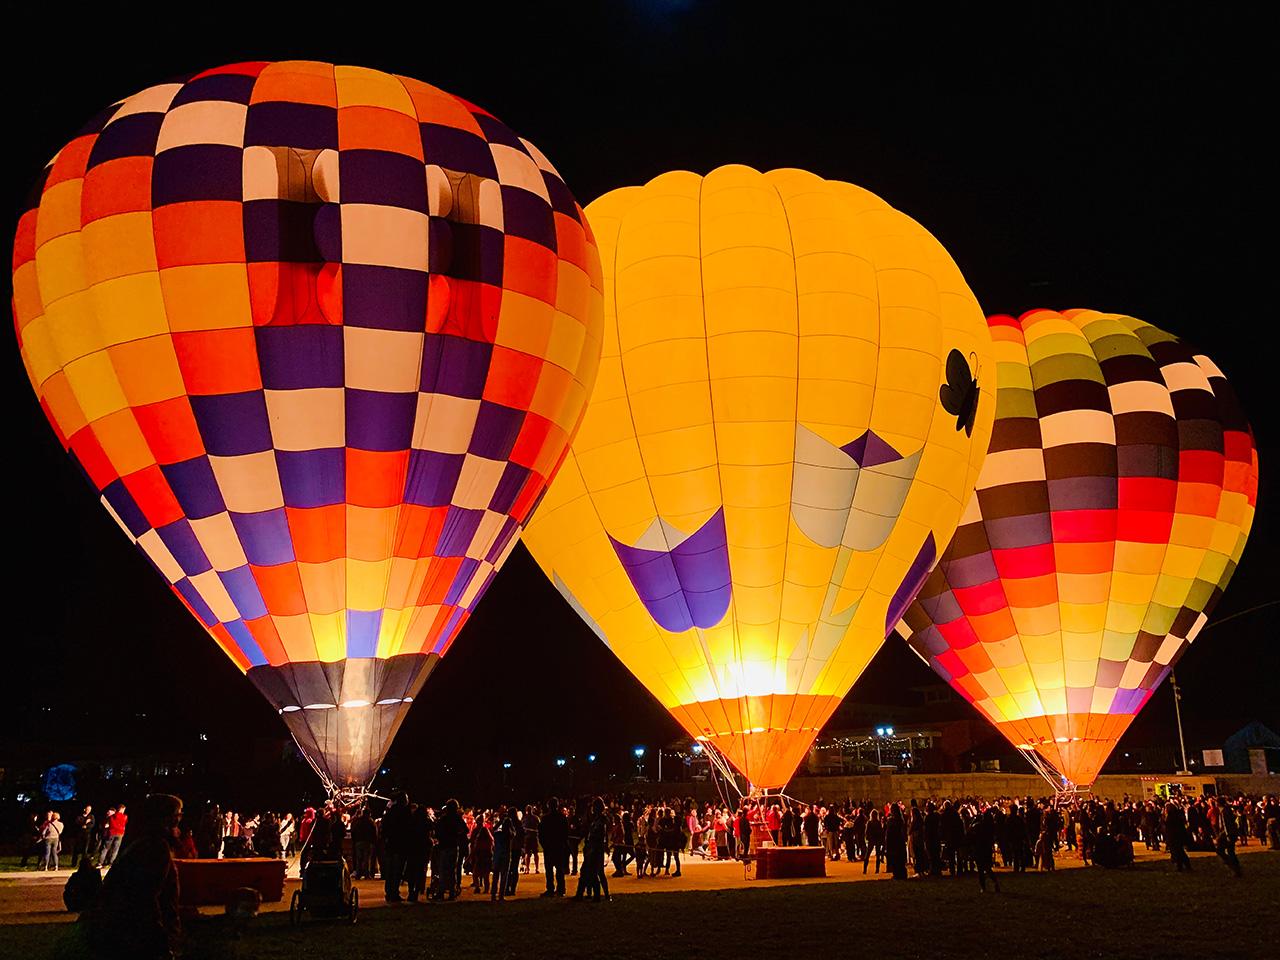 napa lighted arts festival hot air balloon glow, night glow